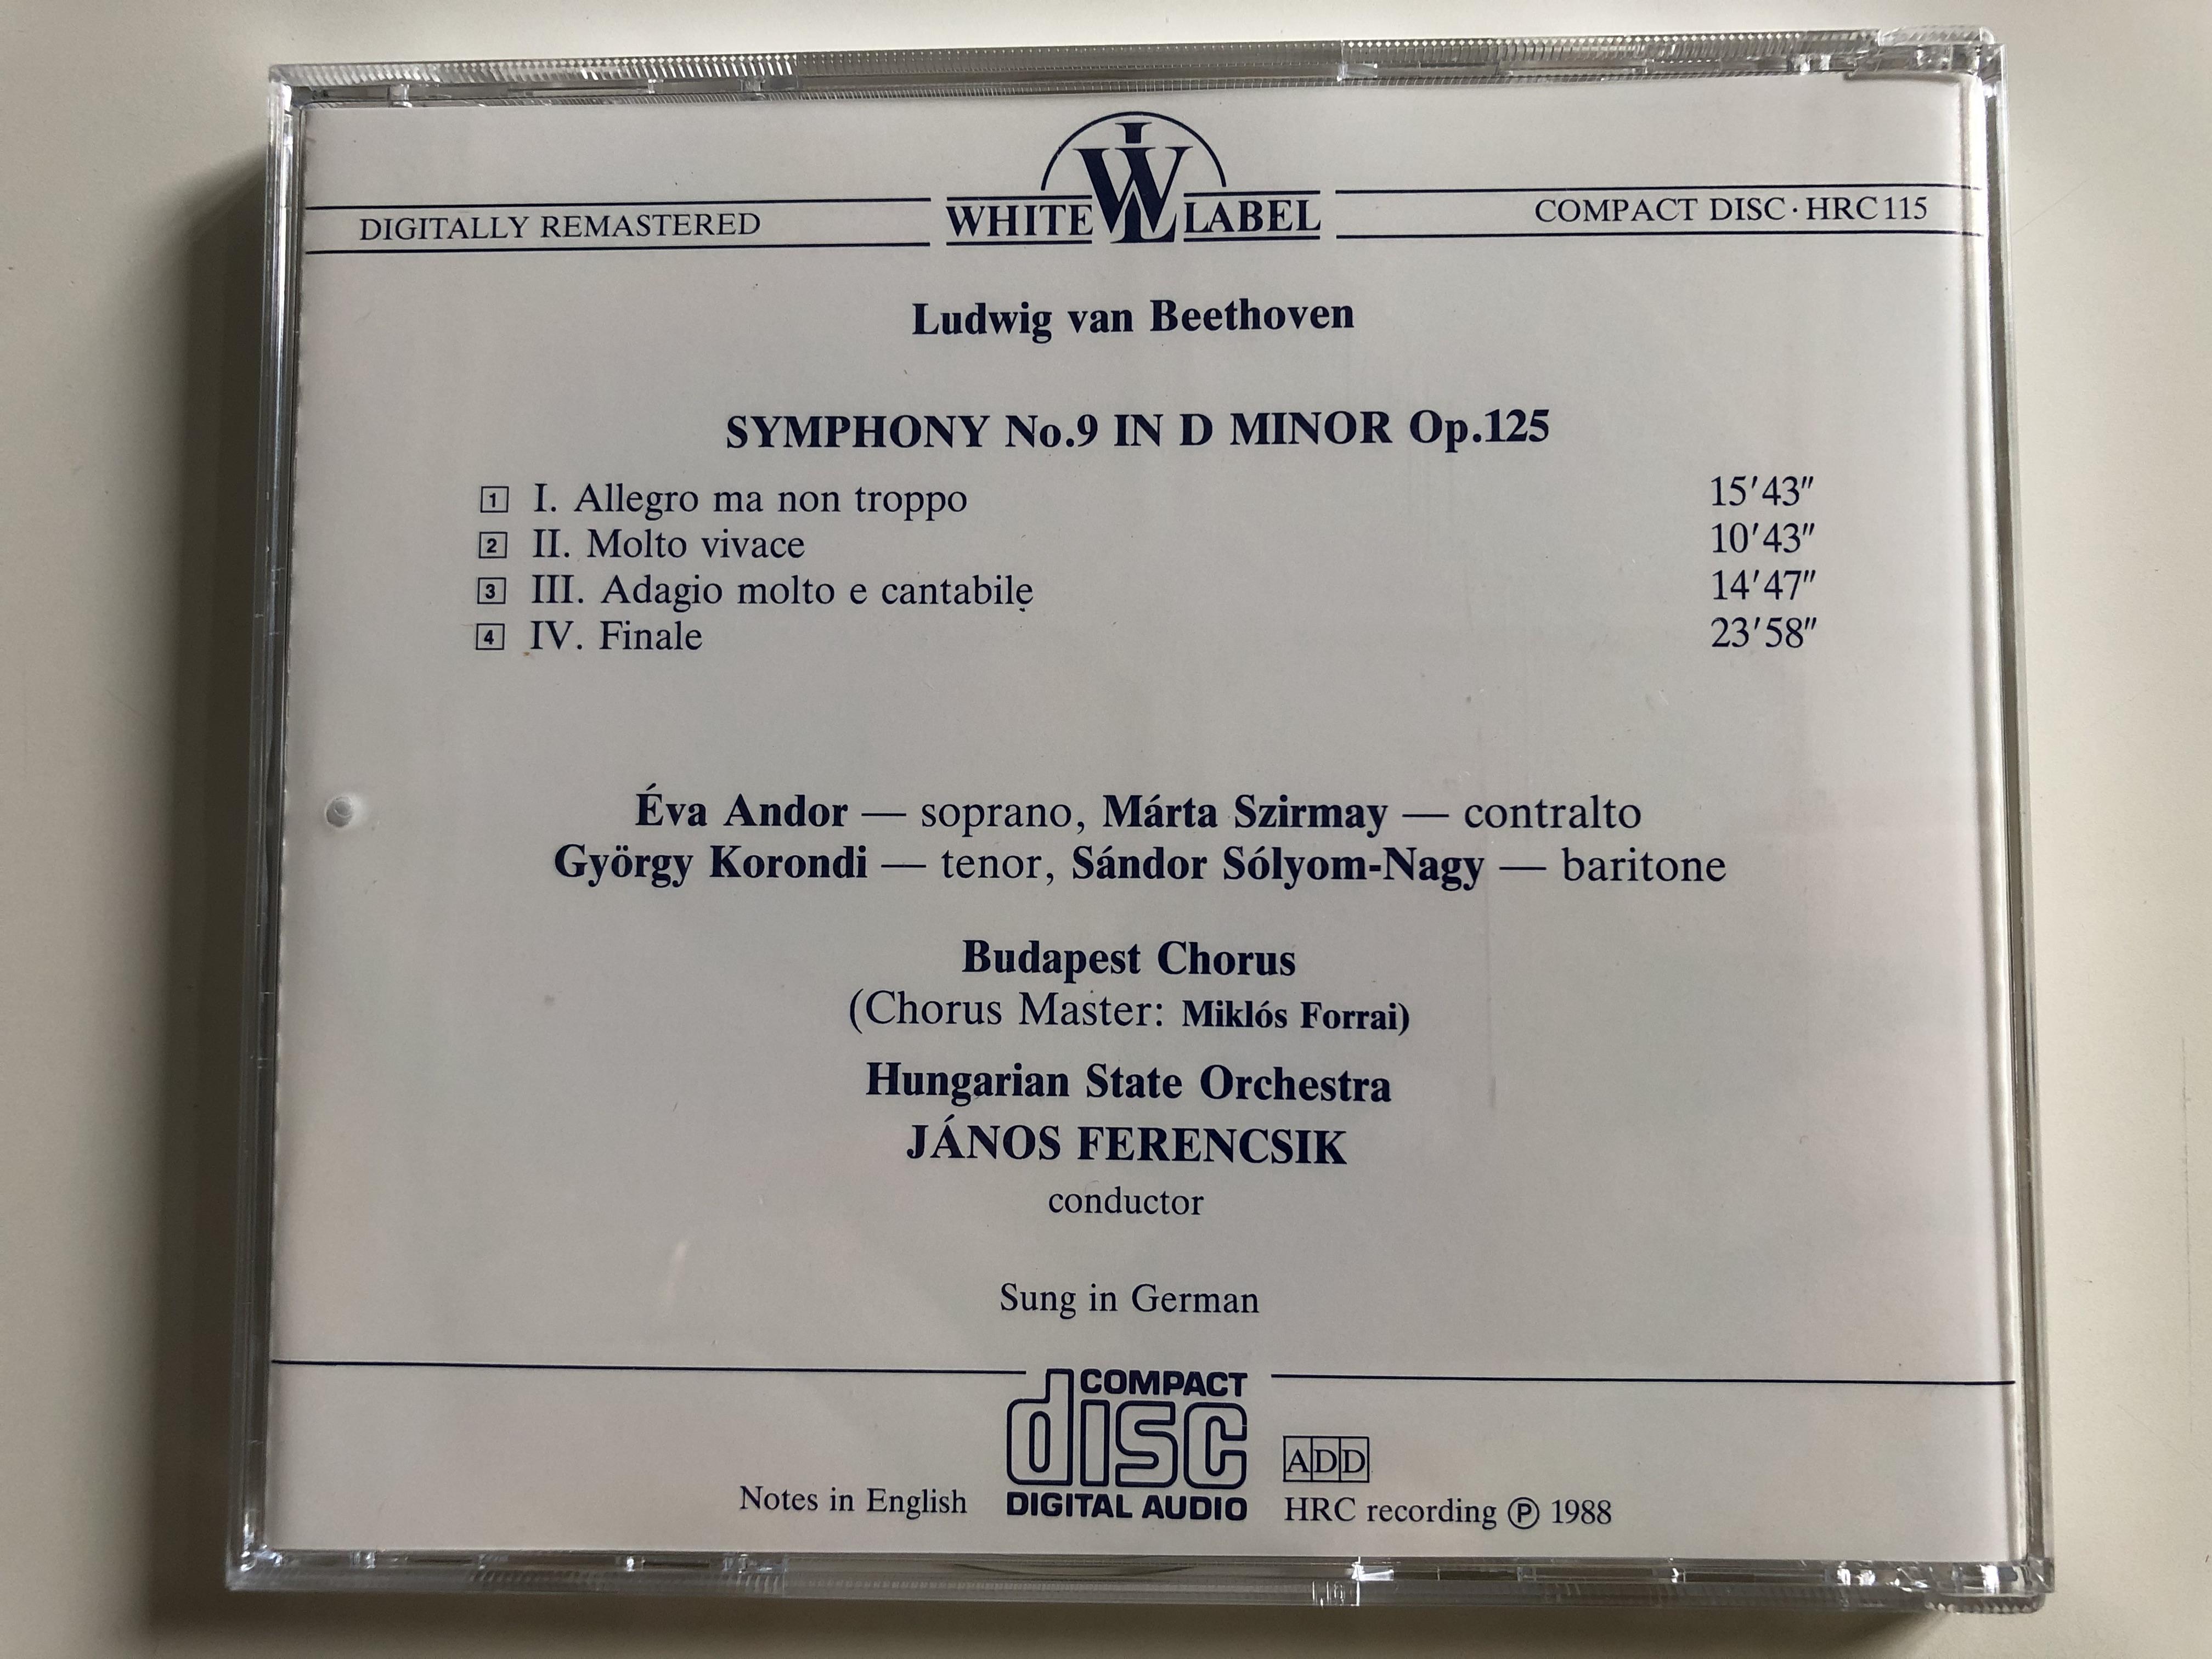 beethoven-symphony-no.-9-va-andor-m-rta-szirmay-gy-rgy-korondi-s-ndor-s-lyom-nagy-budapest-chorus-hungarian-state-orchestra-conducted-by-j-nos-ferencsik-hungaroton-white-label-audio-cd-1988-hrc-115-5-.jpg